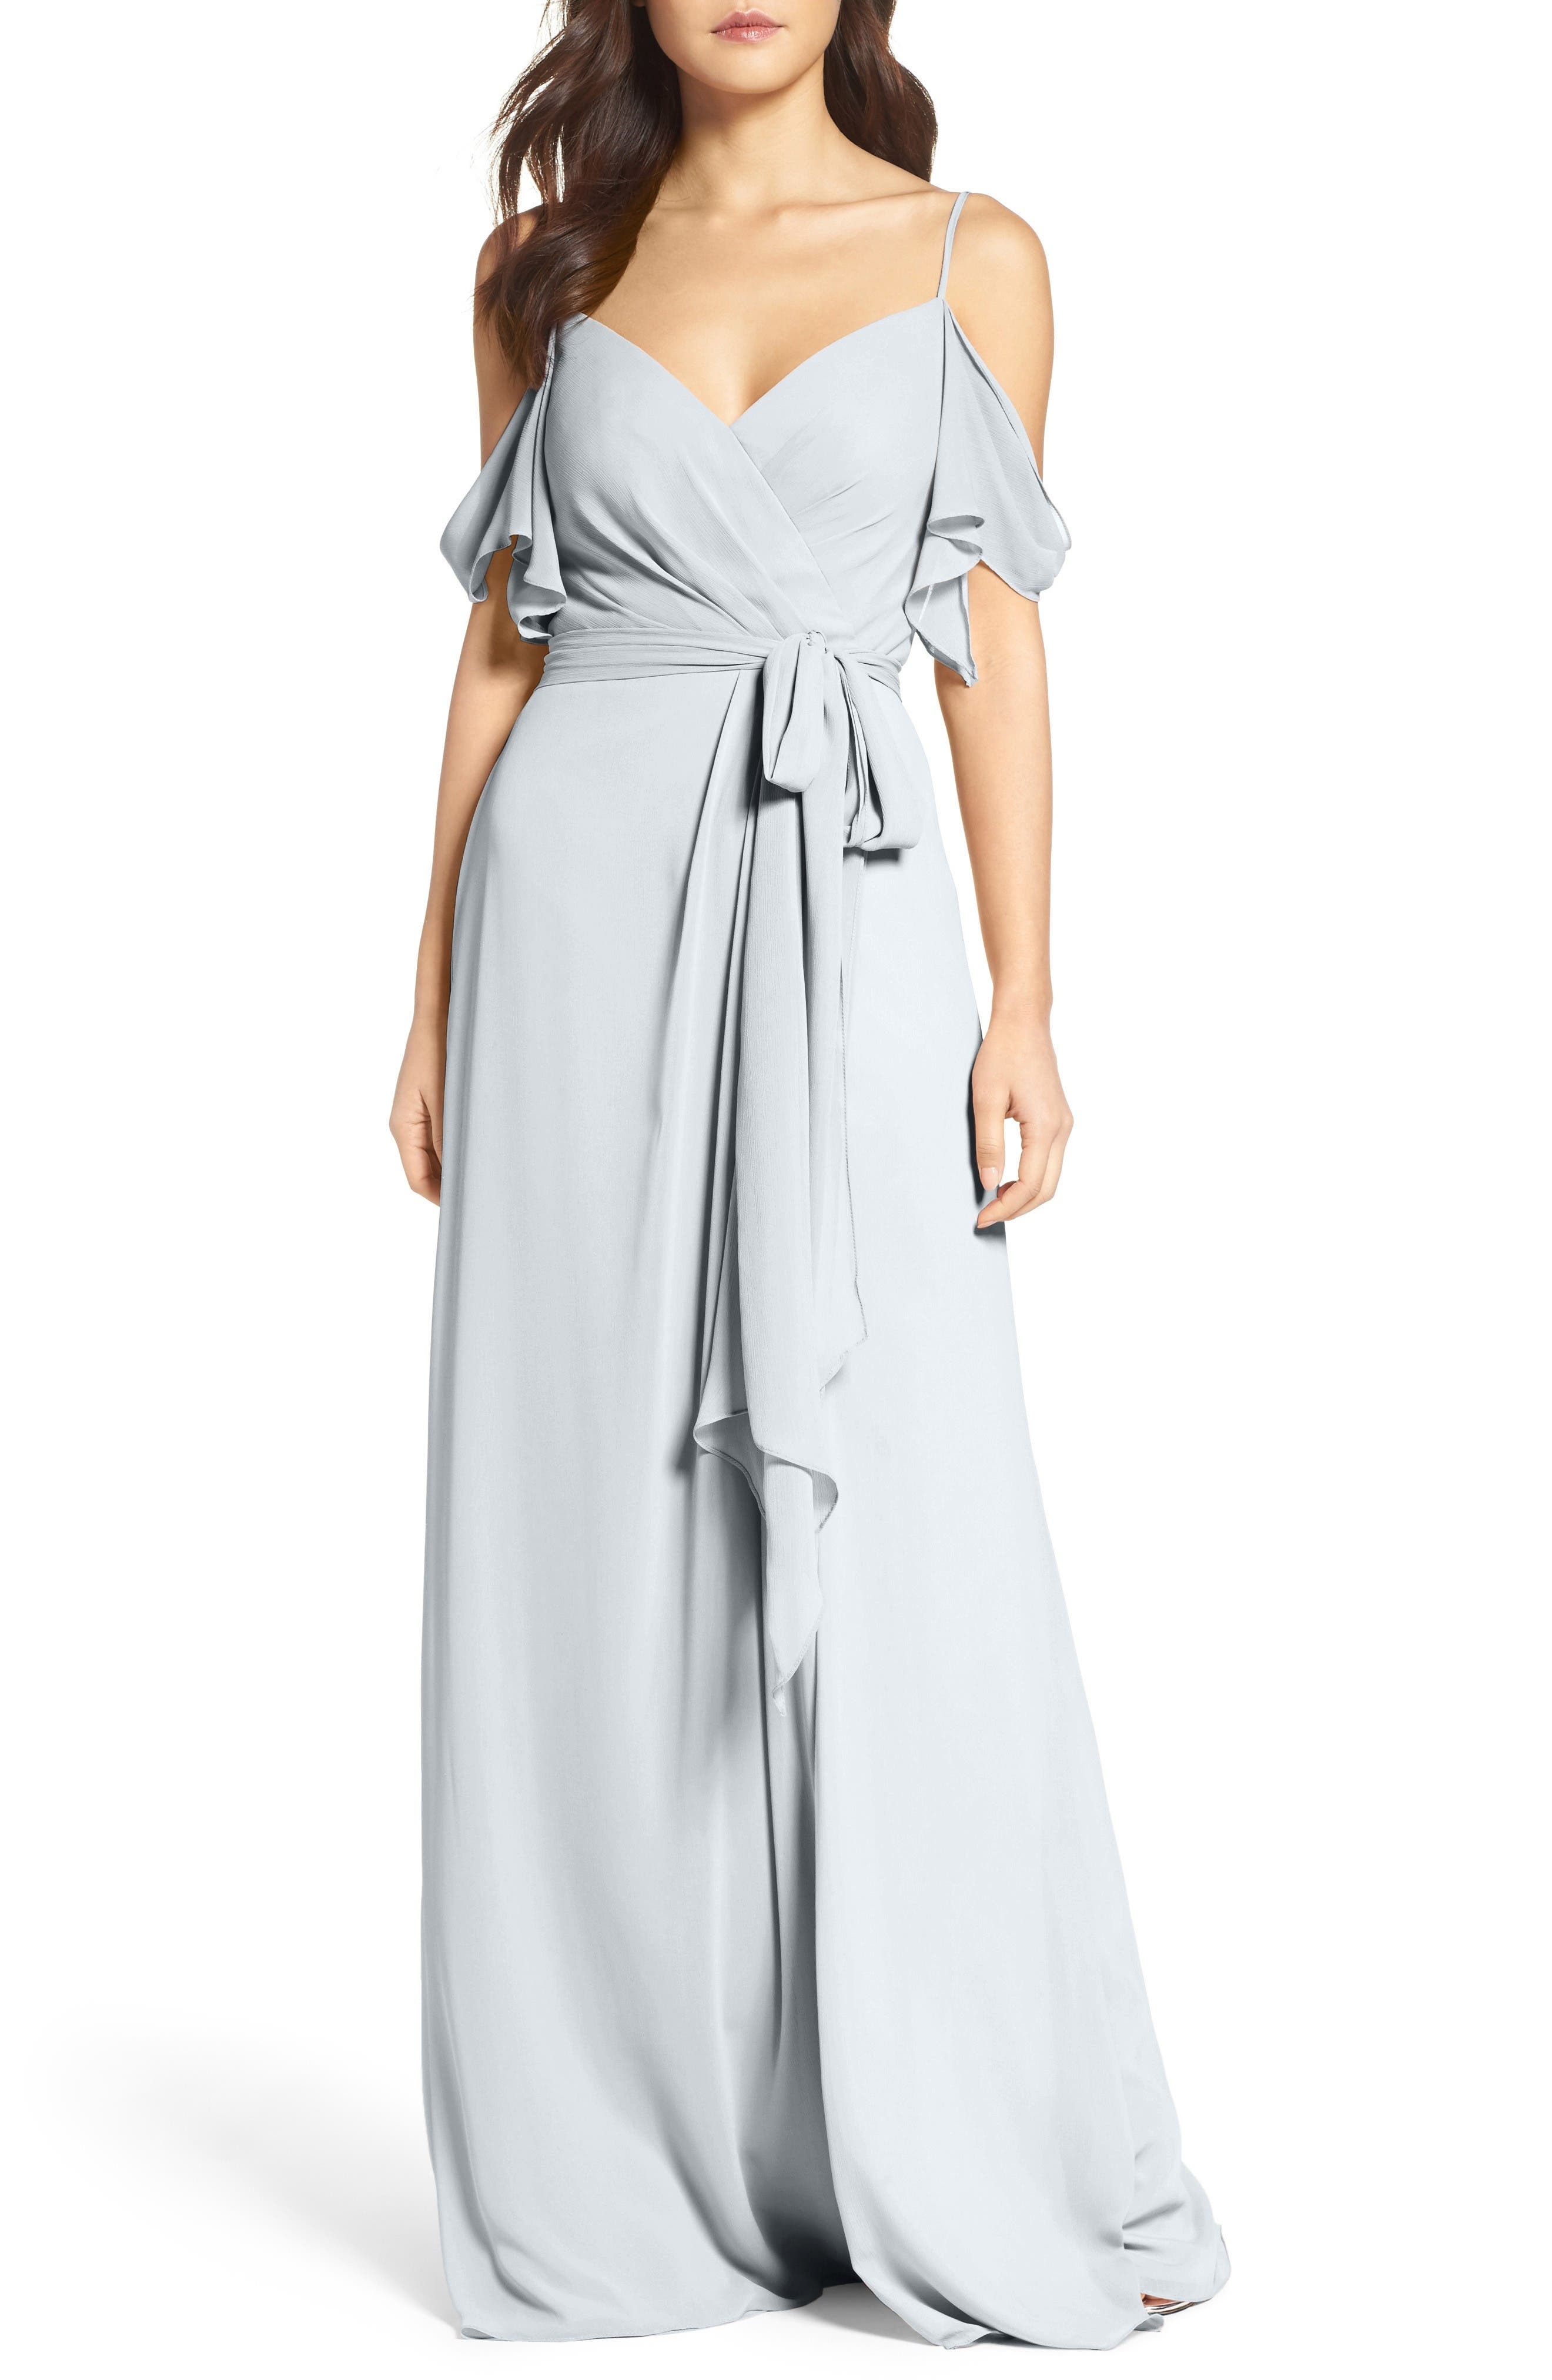 Aldridge A-Line Chiffon Gown,                             Main thumbnail 1, color,                             FRENCH BLUE